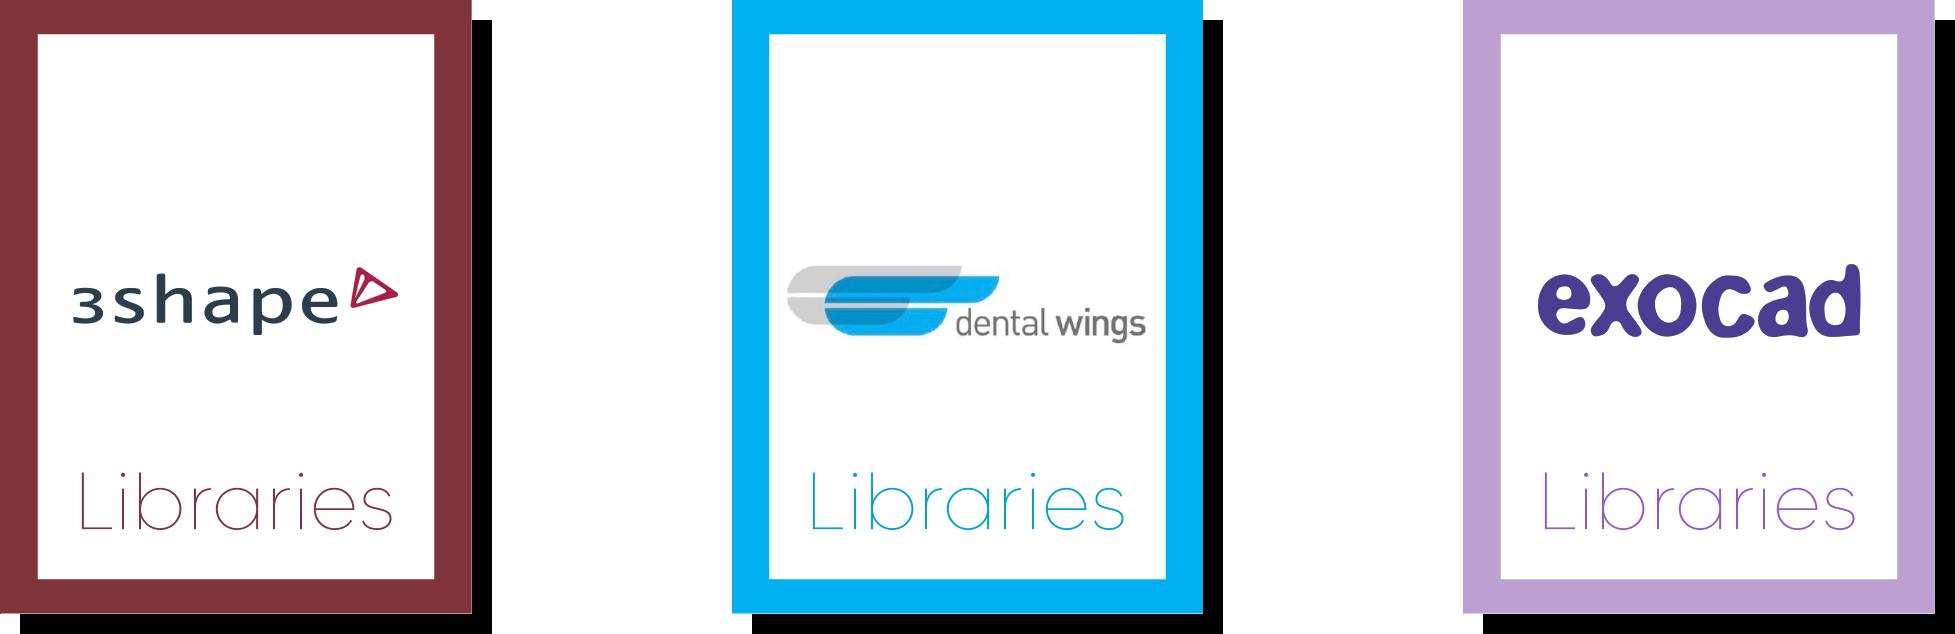 Logiciels de planification : 3shape, Dental wings, Exocad